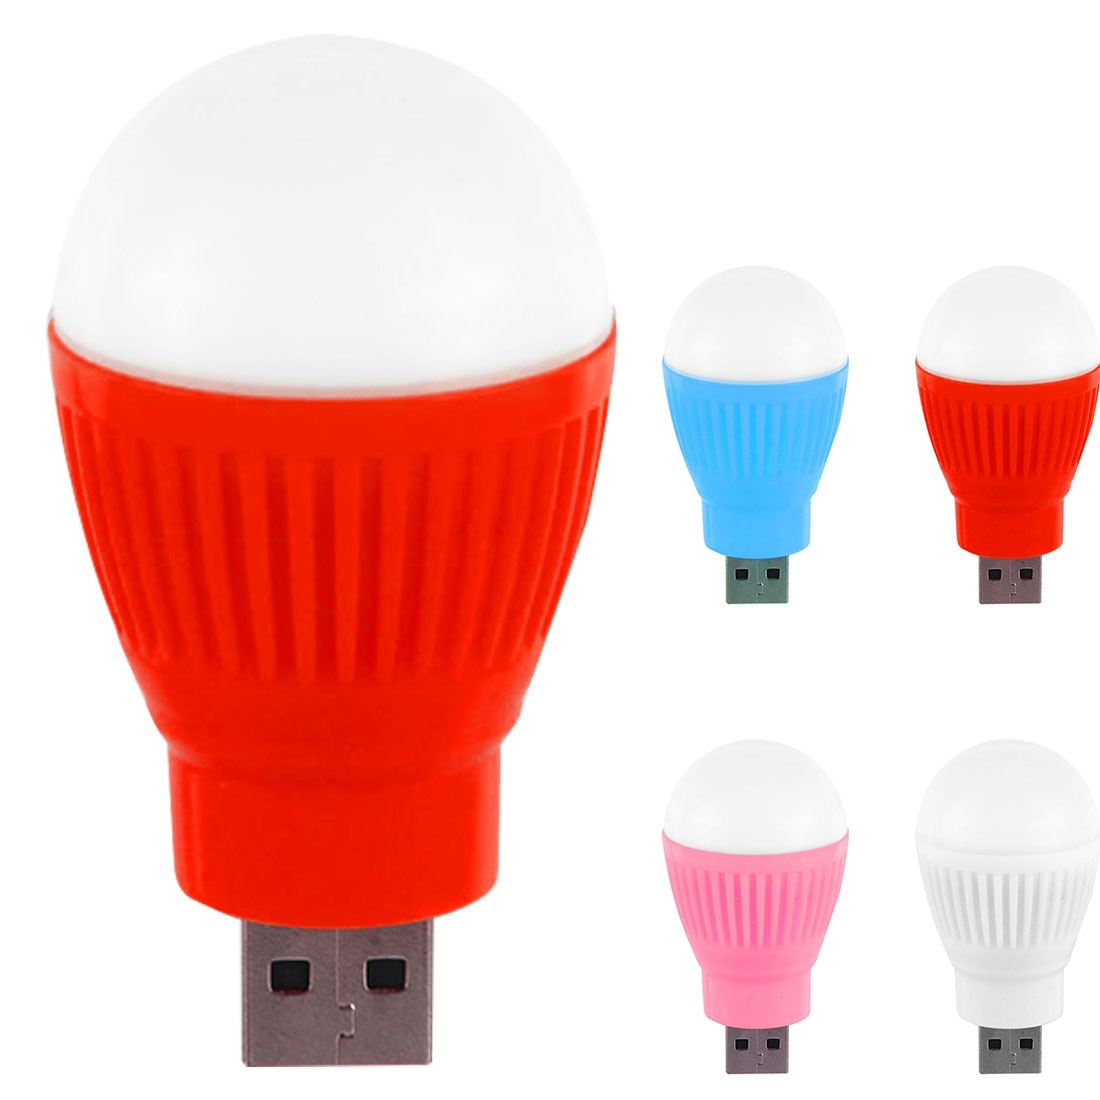 Mini bombilla led USB linterna redonda al aire libre luz de noche lámpara de emergencia ordenador portátil ahorro de energía luz de lectura lámpara de Camping